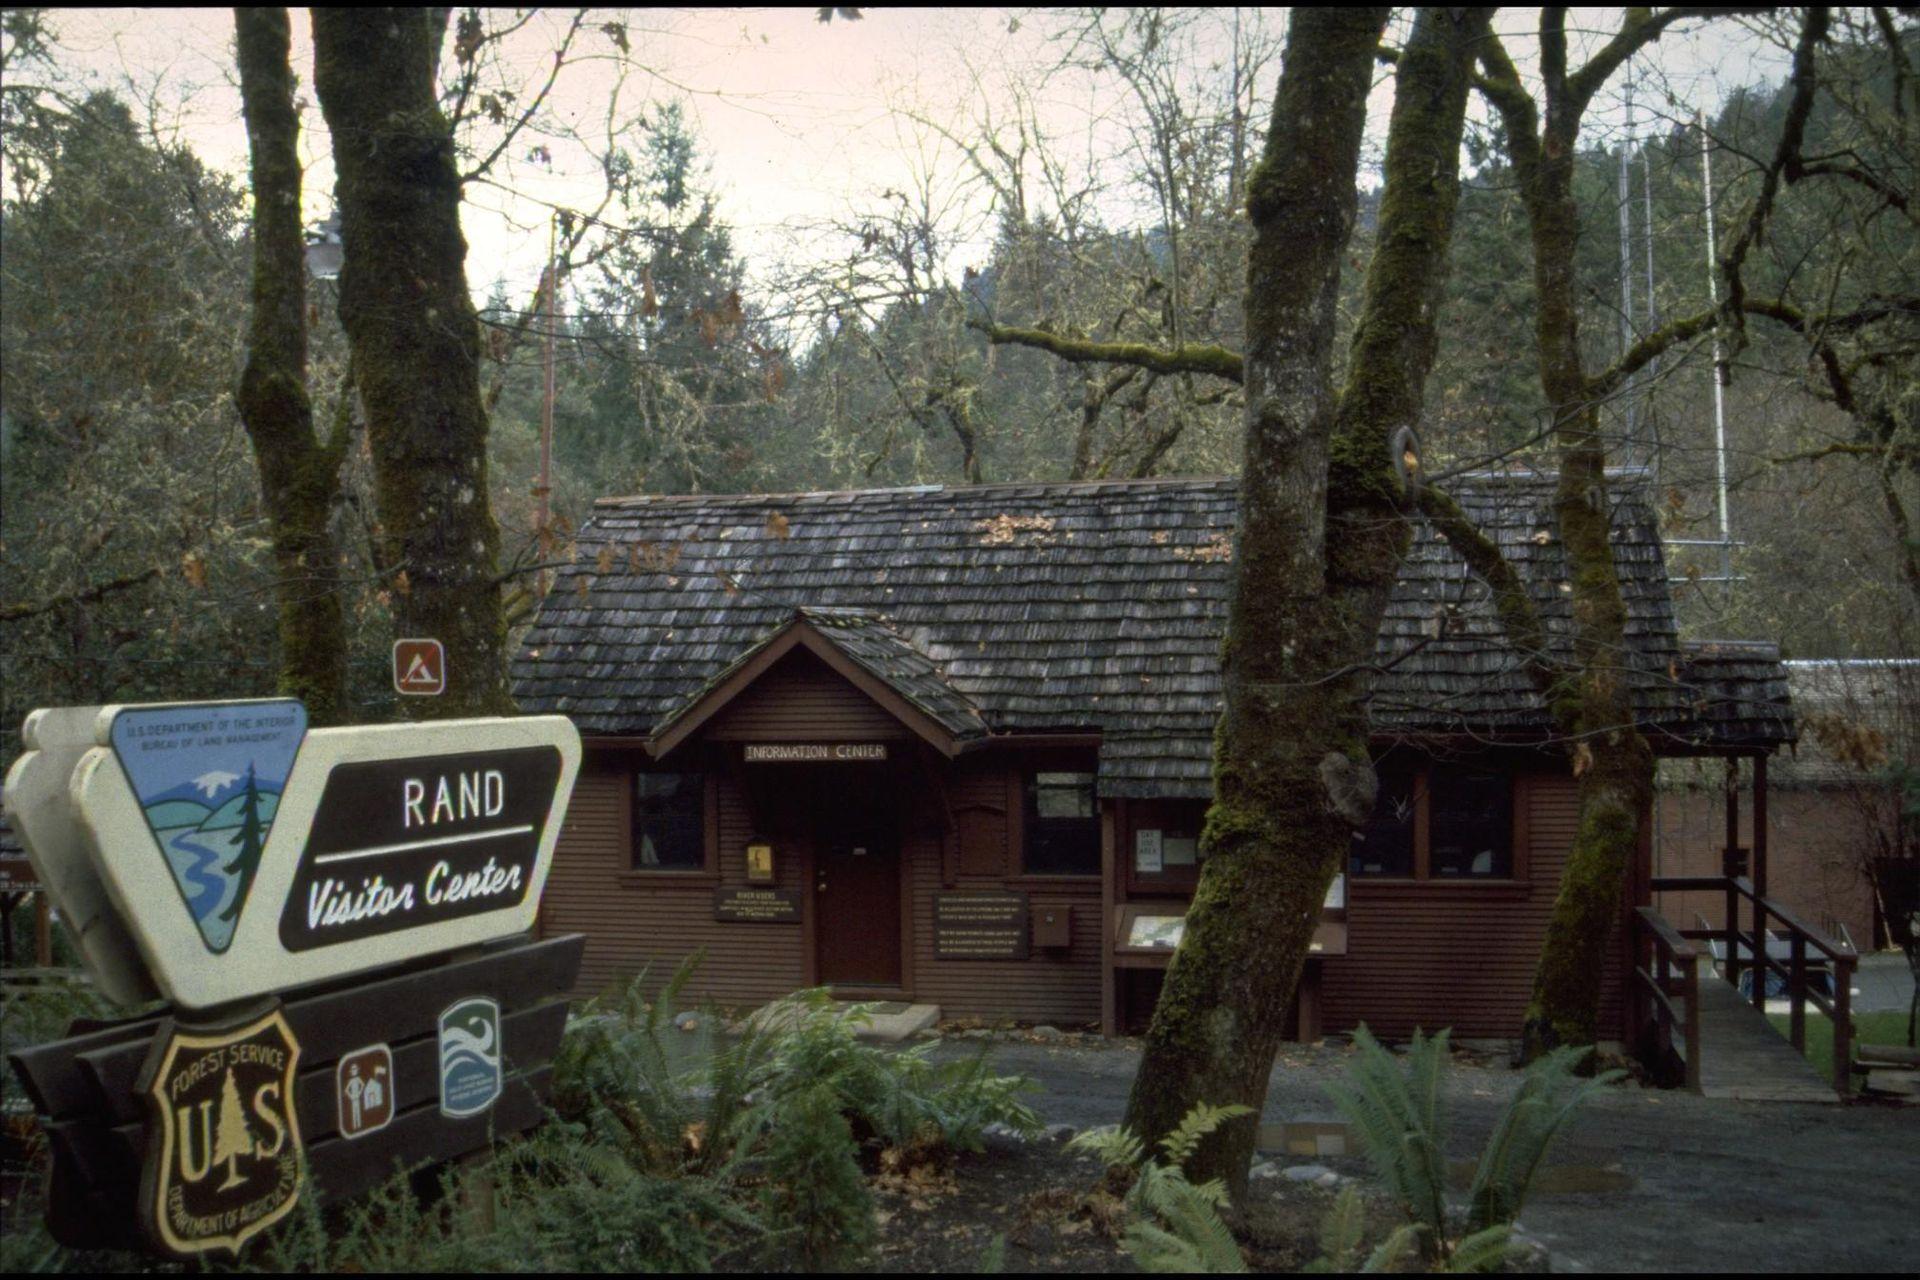 Nearest Service Station >> Rand Ranger Station - Wikipedia